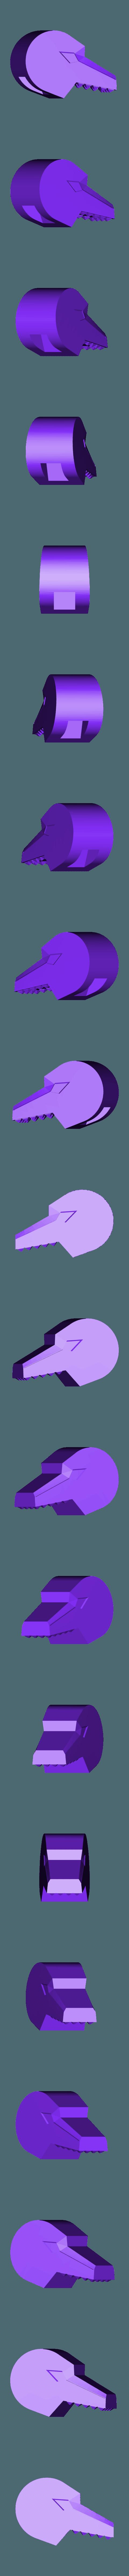 Head.STL Download STL file Grimlock • Model to 3D print, biglildesign